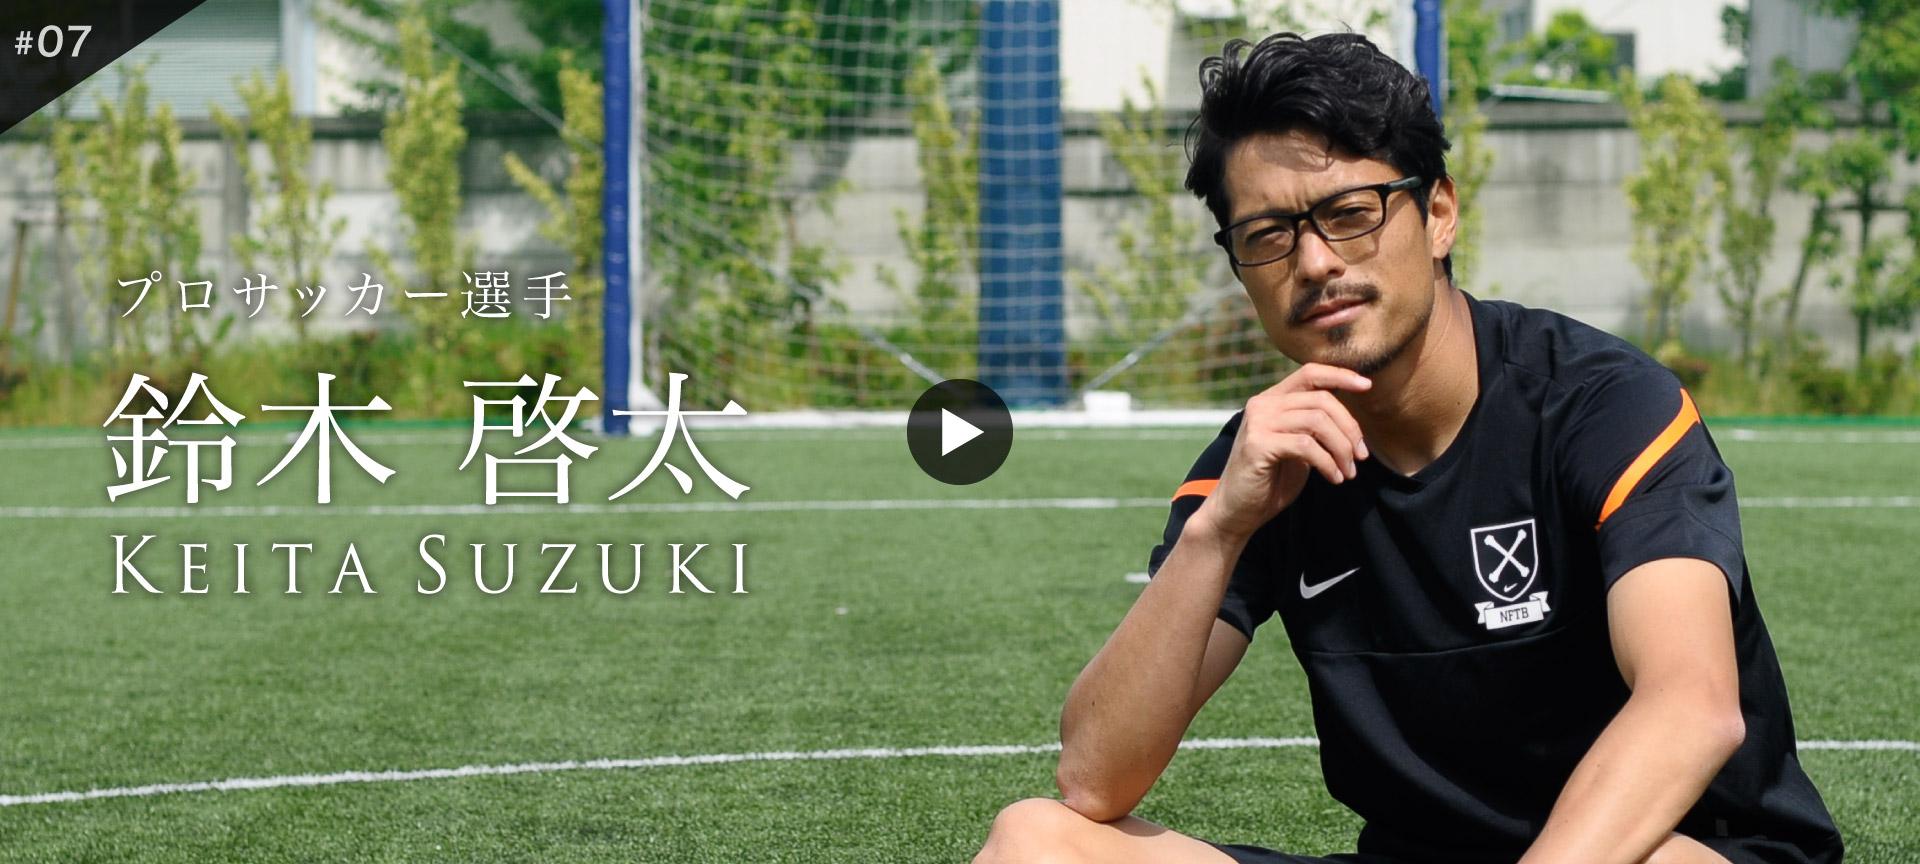 OWNDAYS MEETS 鈴木啓太(Suzuki Keita)